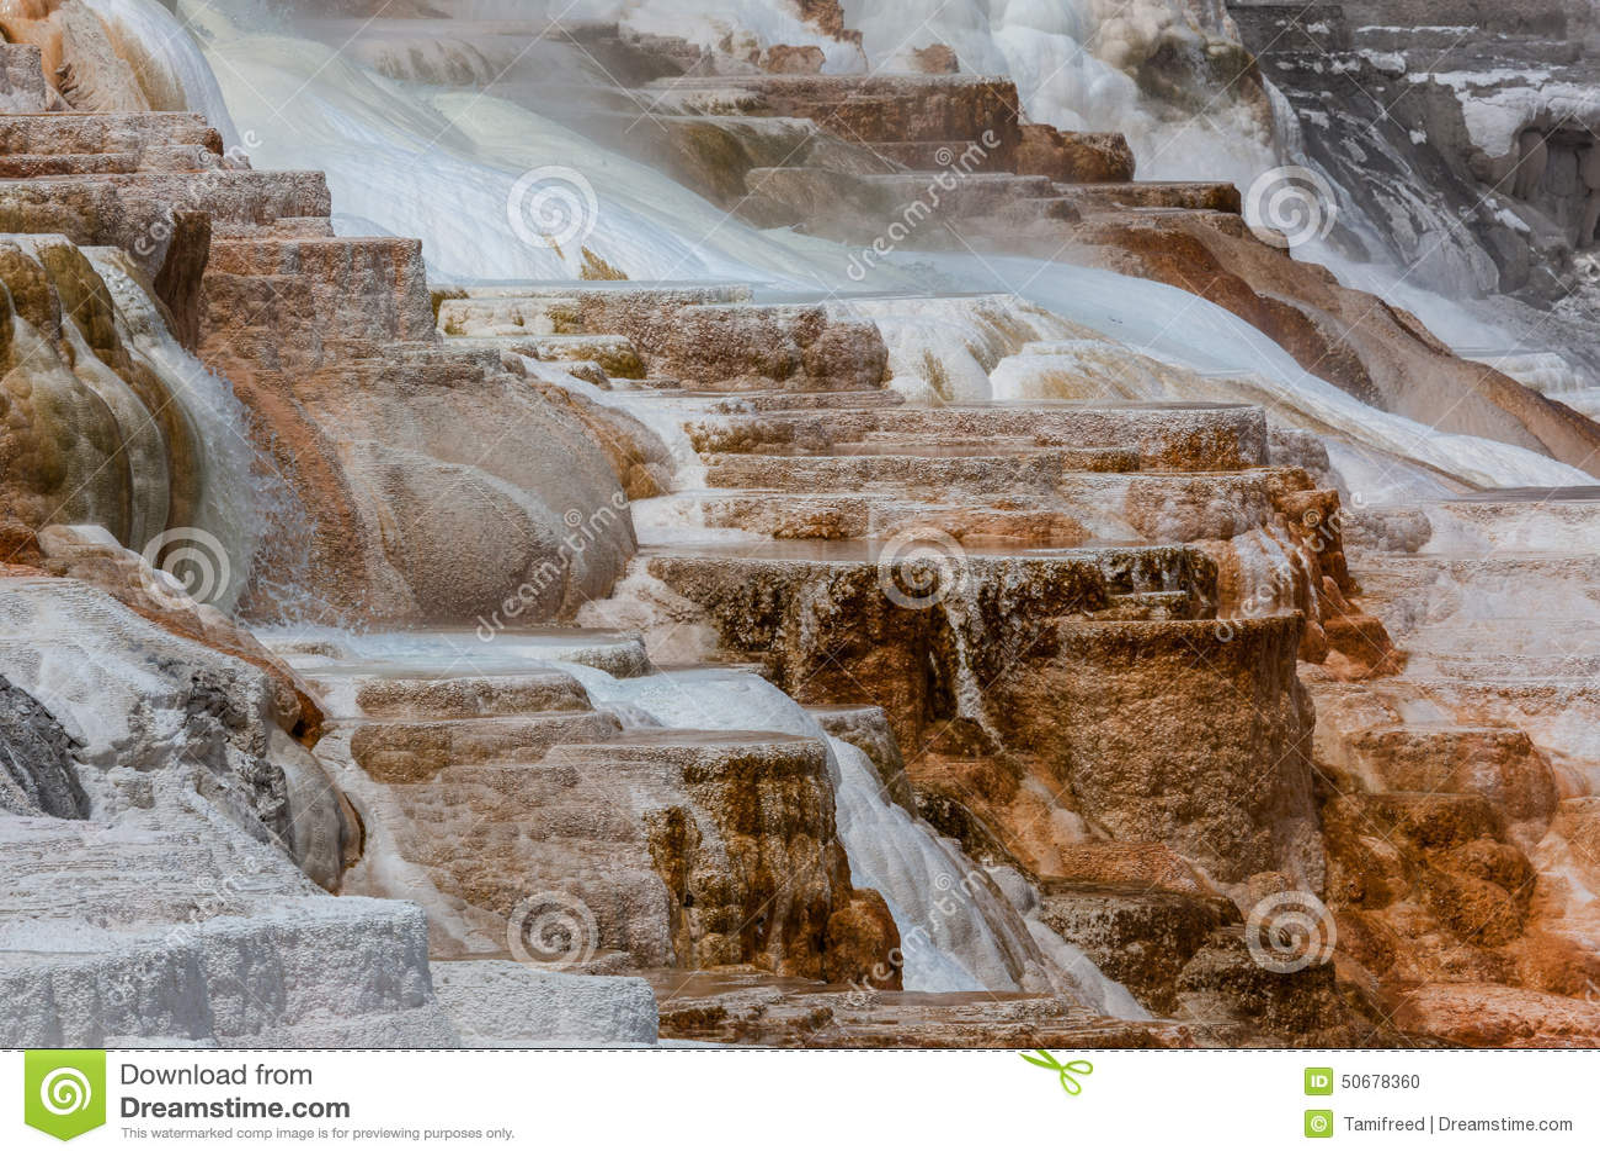 Download 温泉城瀑布 库存照片. 图片 包括有 北部, 五颜六色, 冒险家, 状态, 爱达荷, 外面, 秋天, 国家 - 50678360